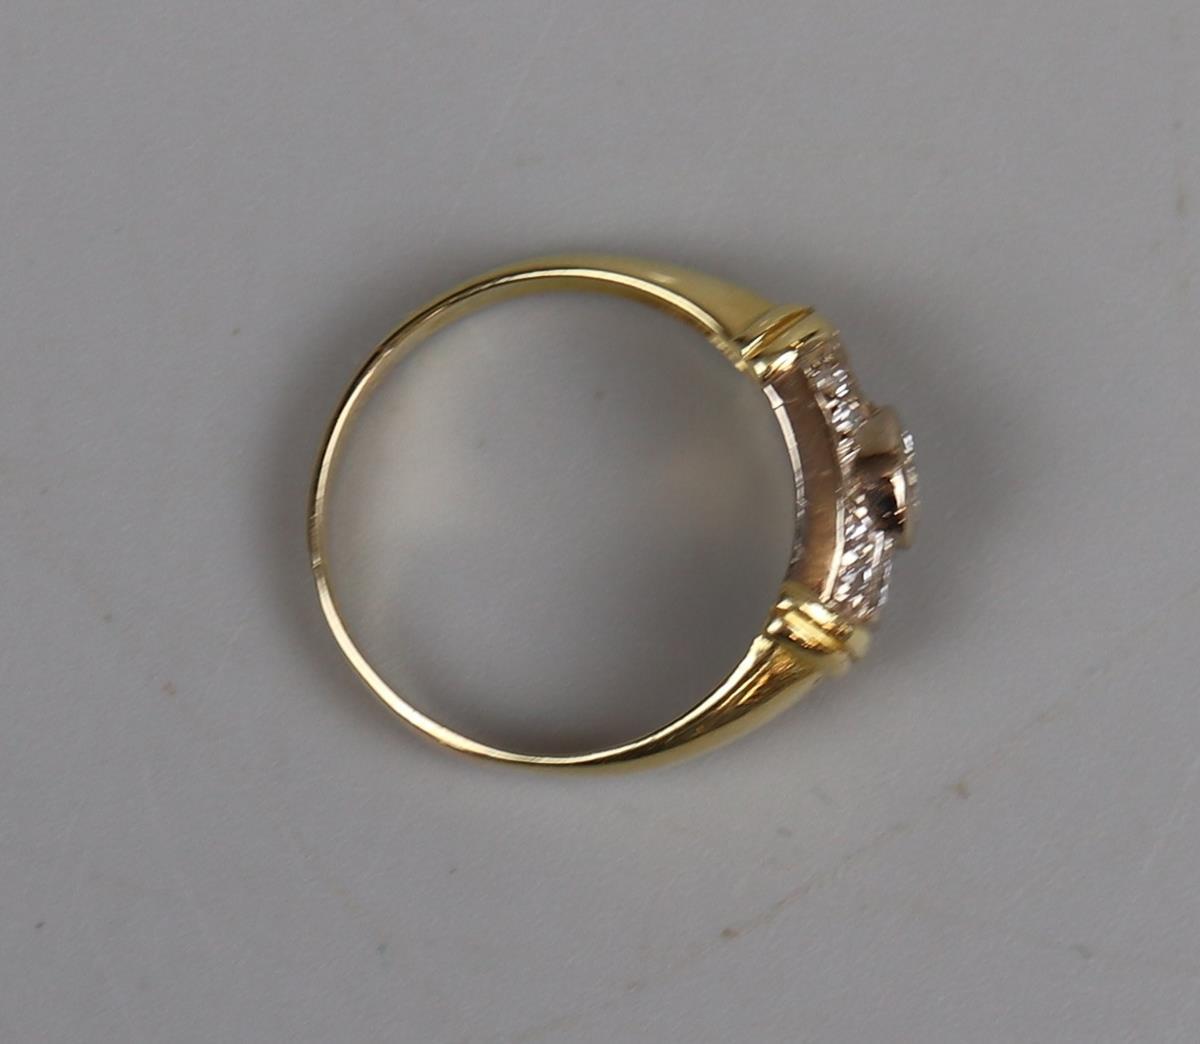 Fine 18ct gold diamond set ring - Size M¾ - Image 3 of 3